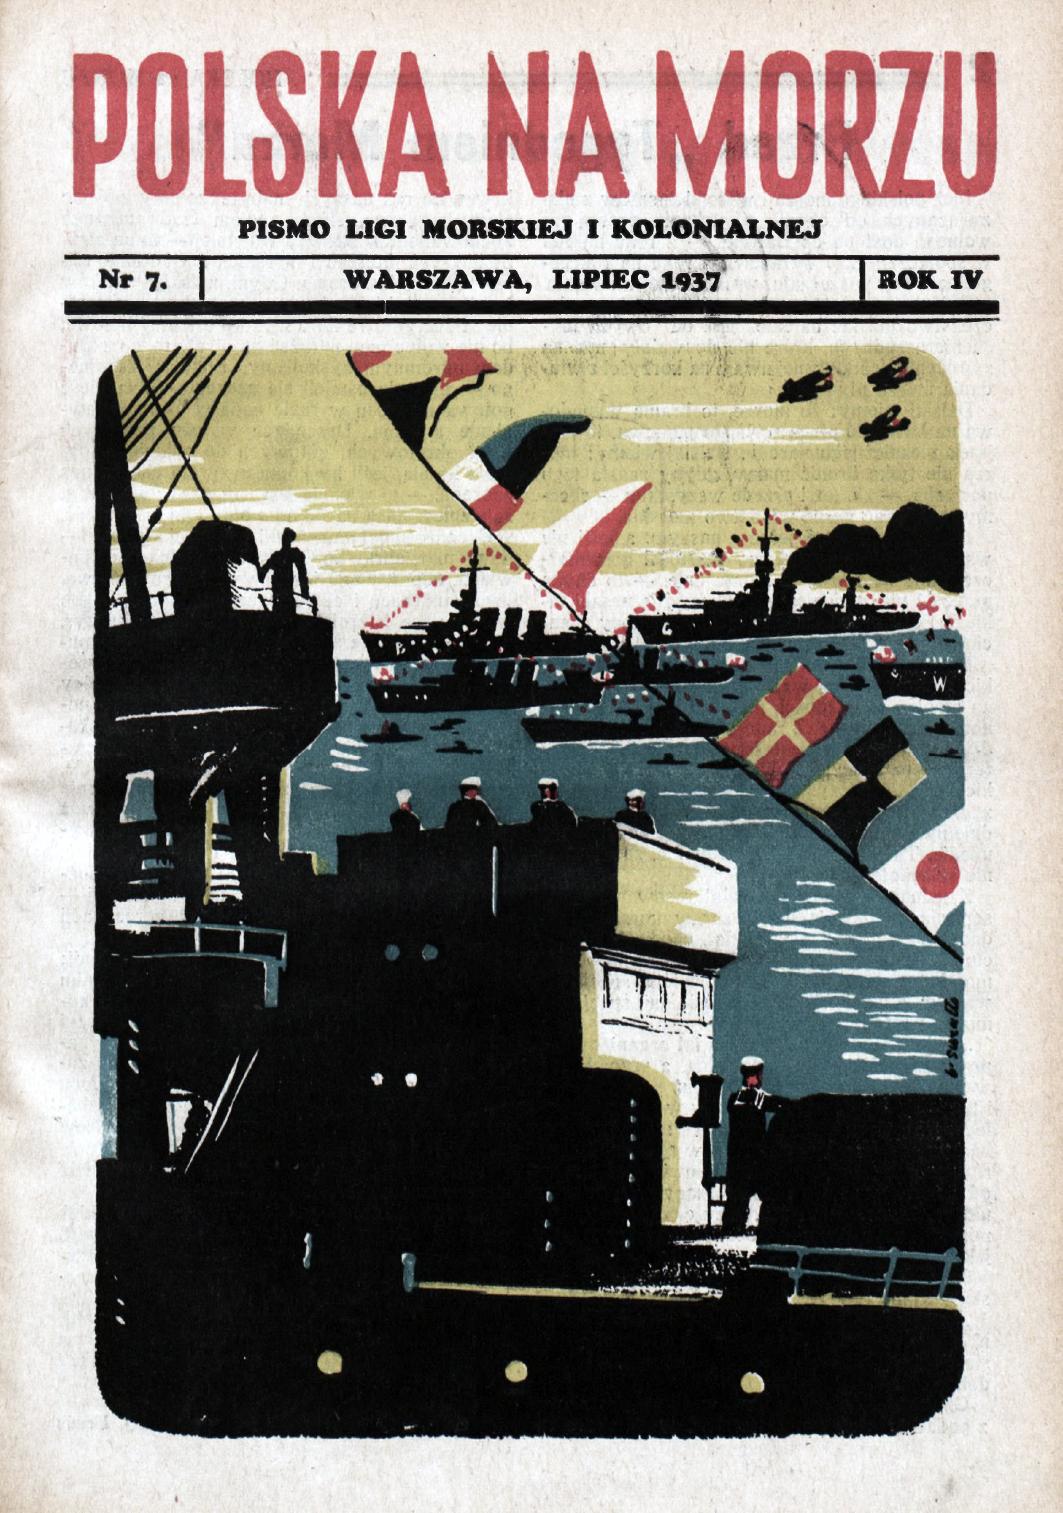 Polska na Morzu : pismo Ligi Morskiej i Kolonjalnej. - Liga Morska i Kolonjalna, 1937, nr 7